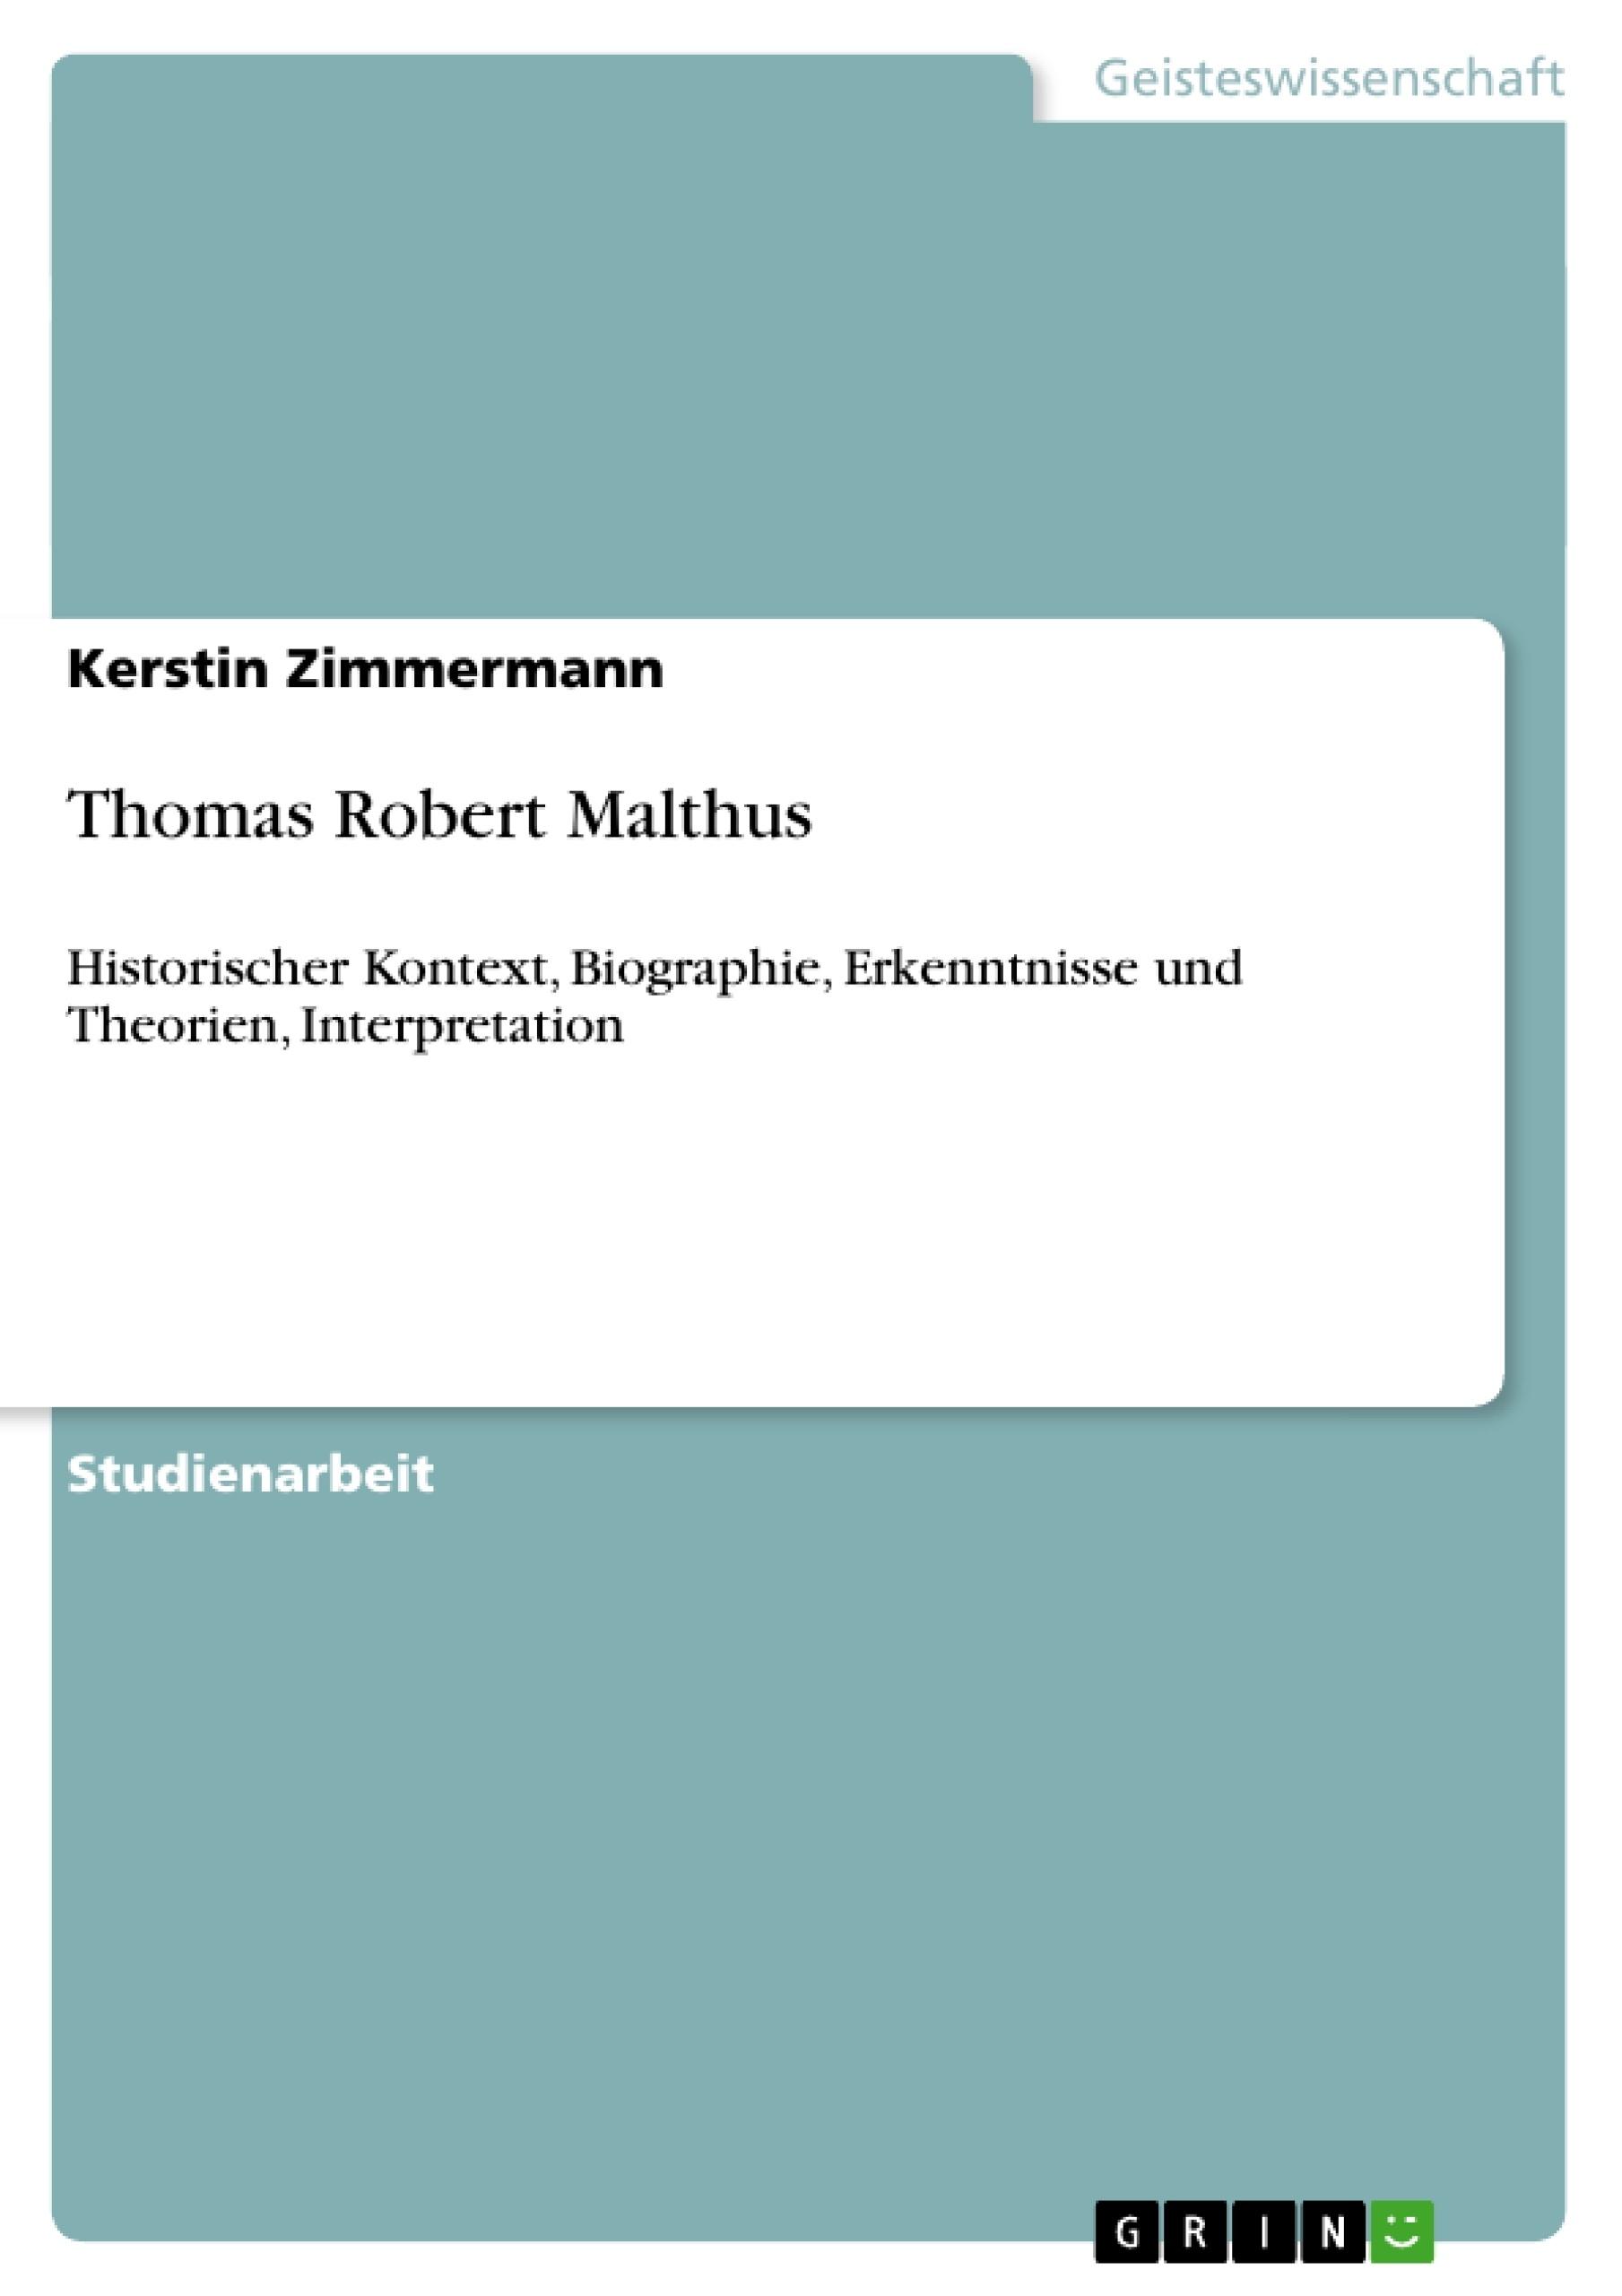 Titel: Thomas Robert Malthus